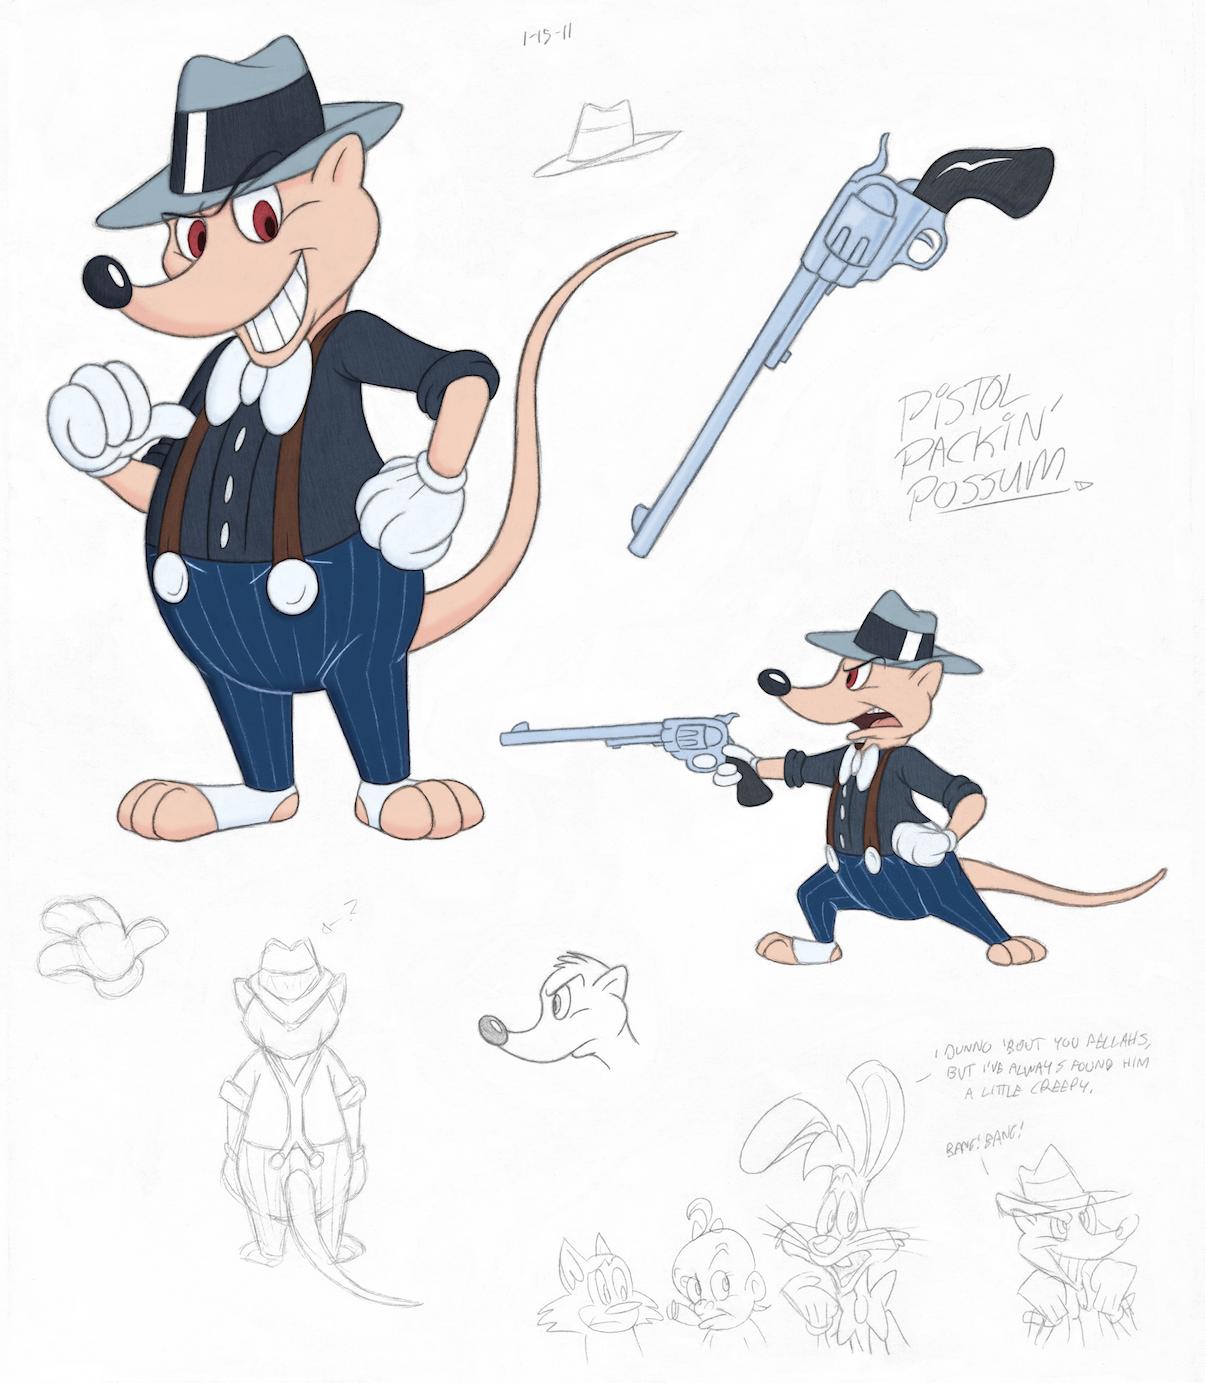 Pistol Packin' Possum by tymime